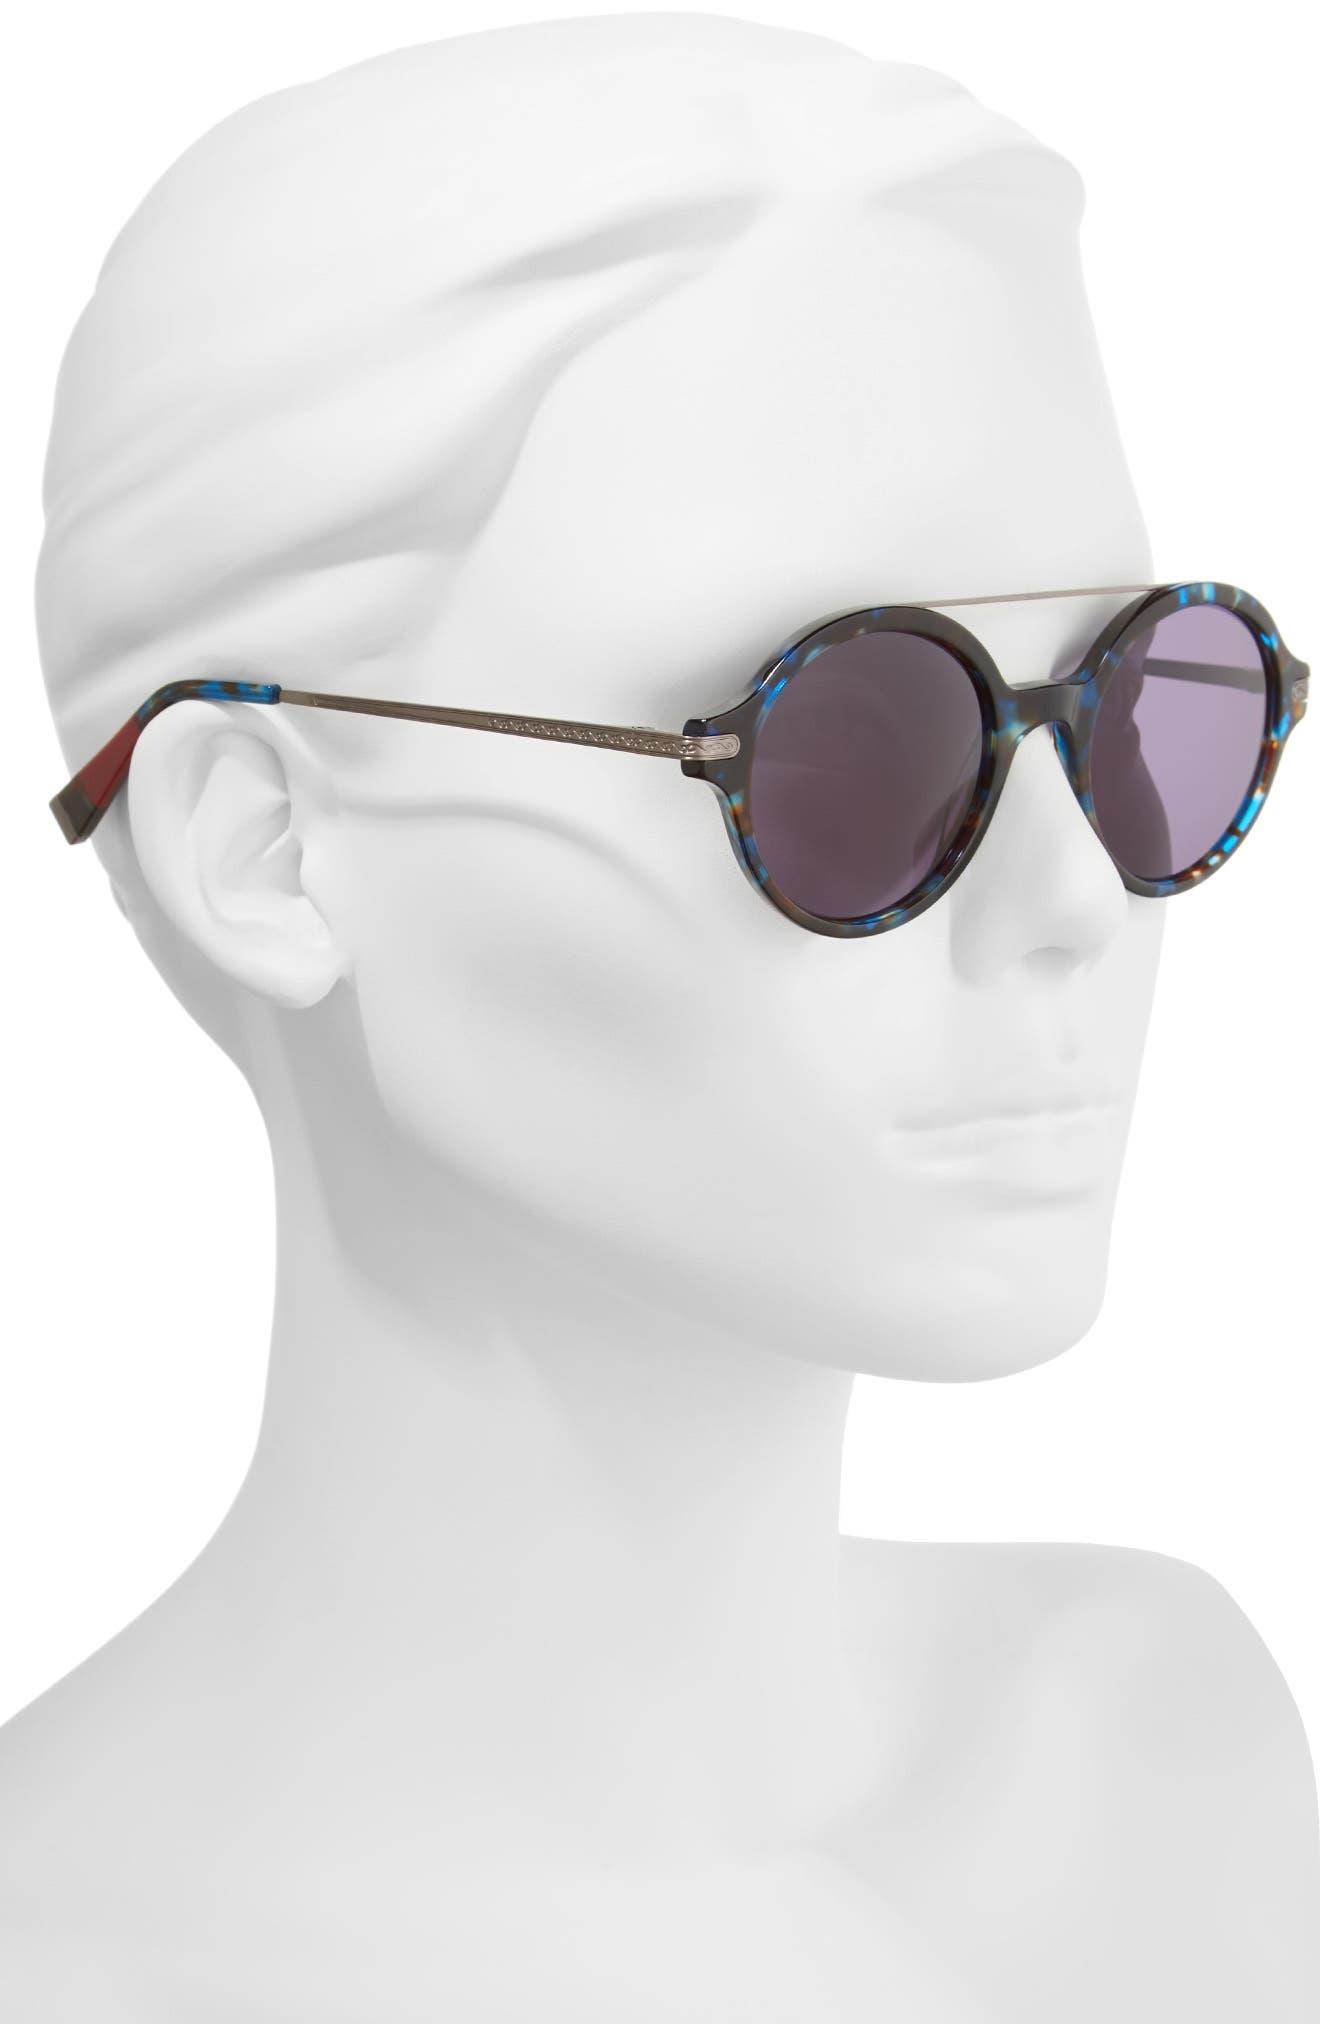 49mm Round Sunglasses,                             Alternate thumbnail 2, color,                             Lapis